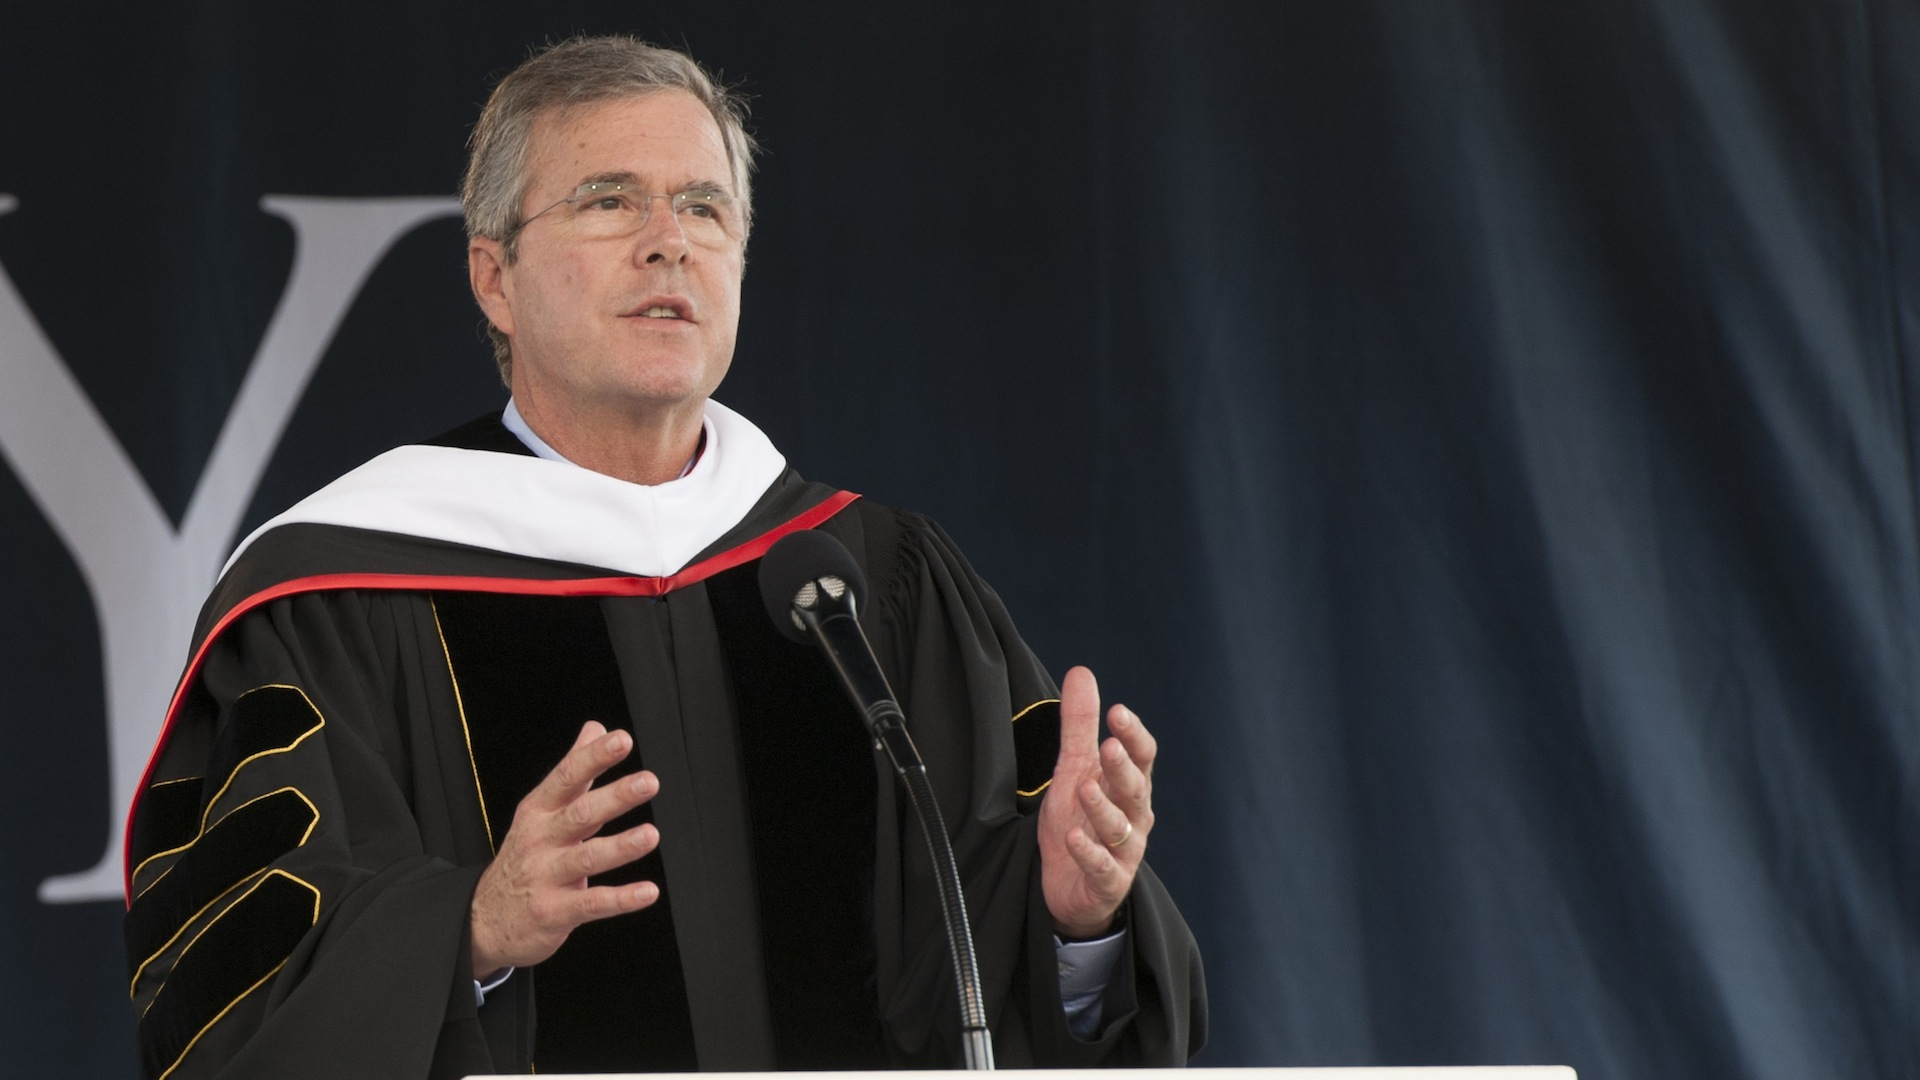 Jeb Bush's eloquent defense of Christianity